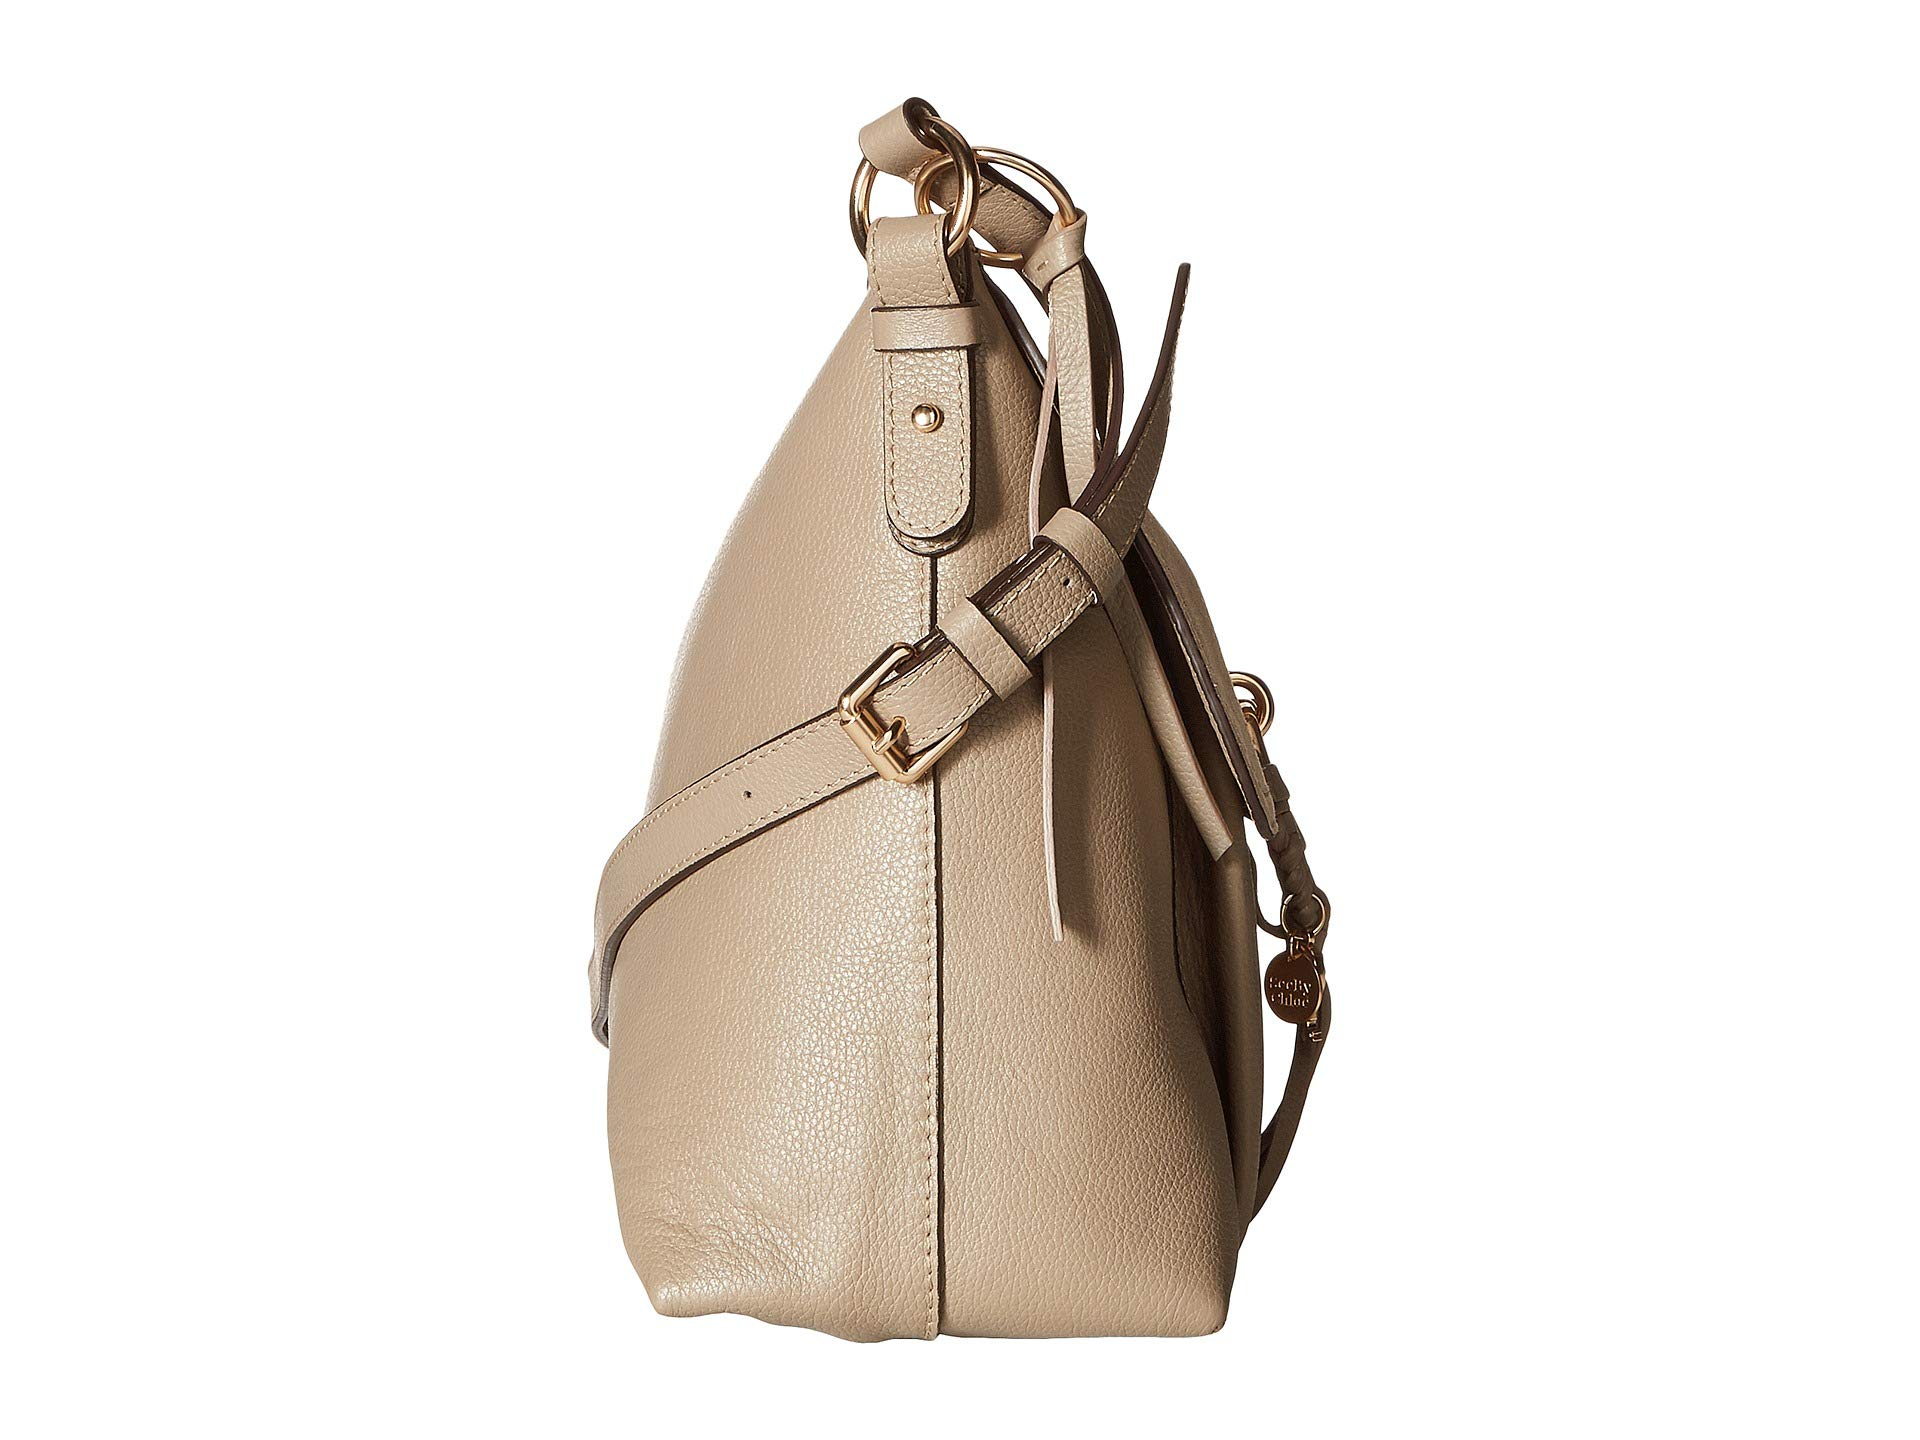 Motty Suede By Shoulder See Bag amp; Medium Joan Grey Chloe Leather AOqq1wZ